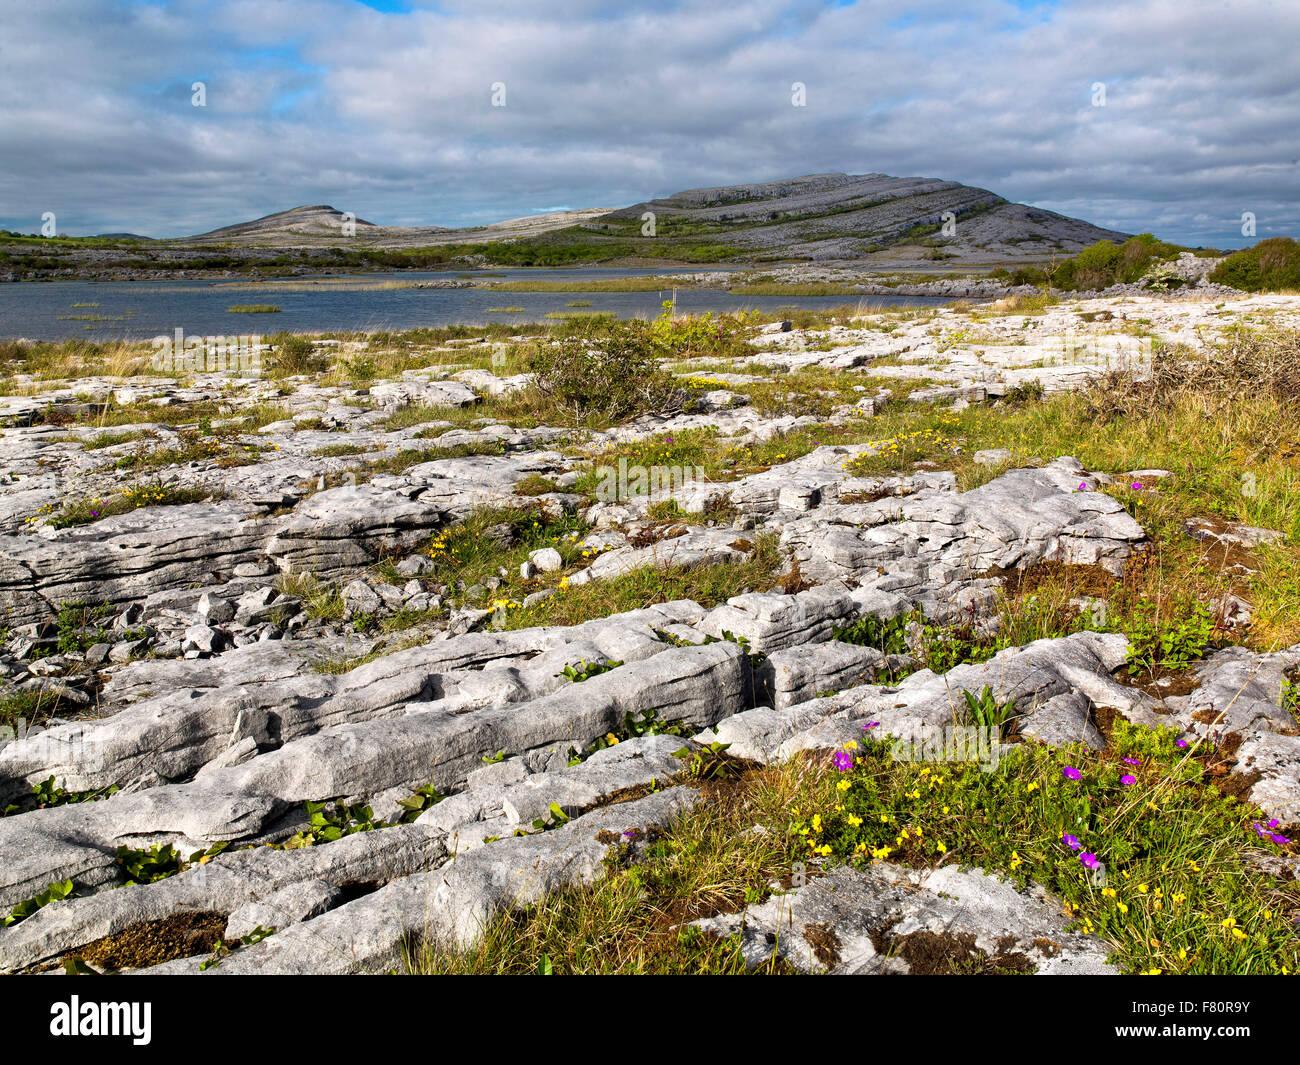 Gealain Lough, Mullagh More, The Burren, County Clare, Ireland, The wild Atlantic Way Stock Photo